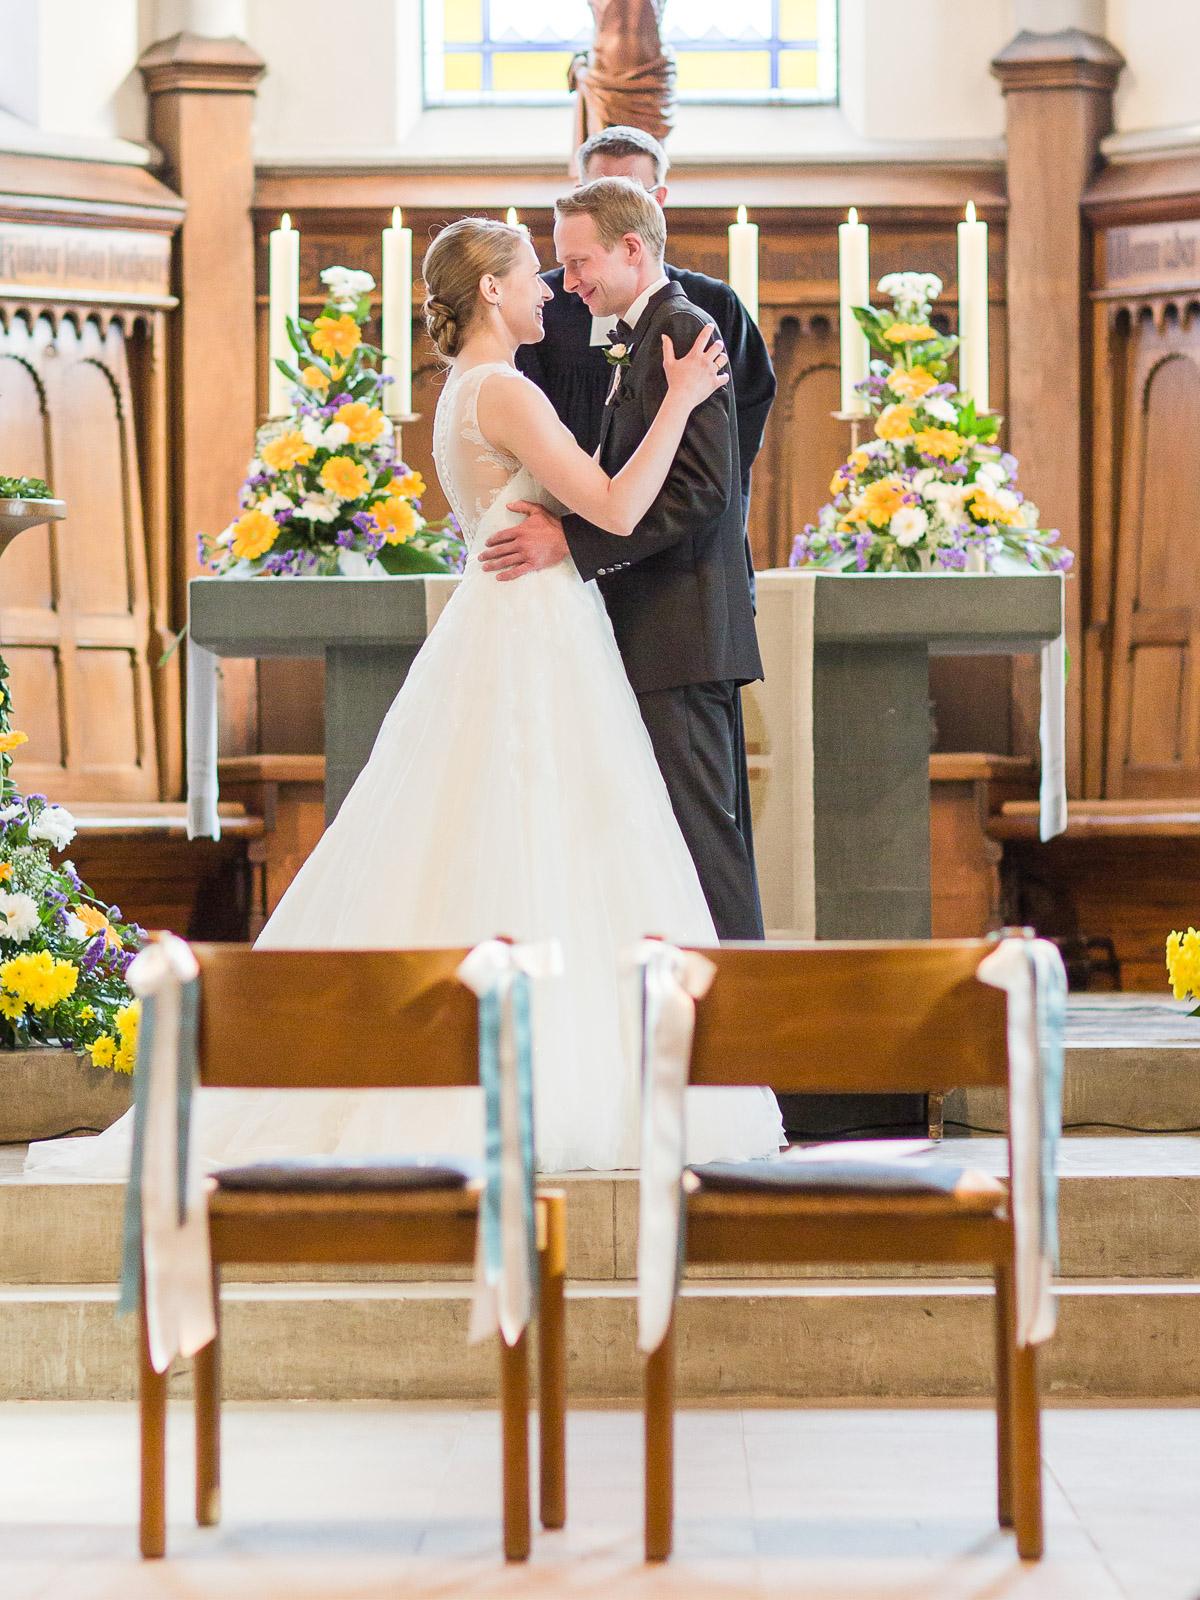 Hochzeitsfotograf-Bielefeld-2016-04-23091